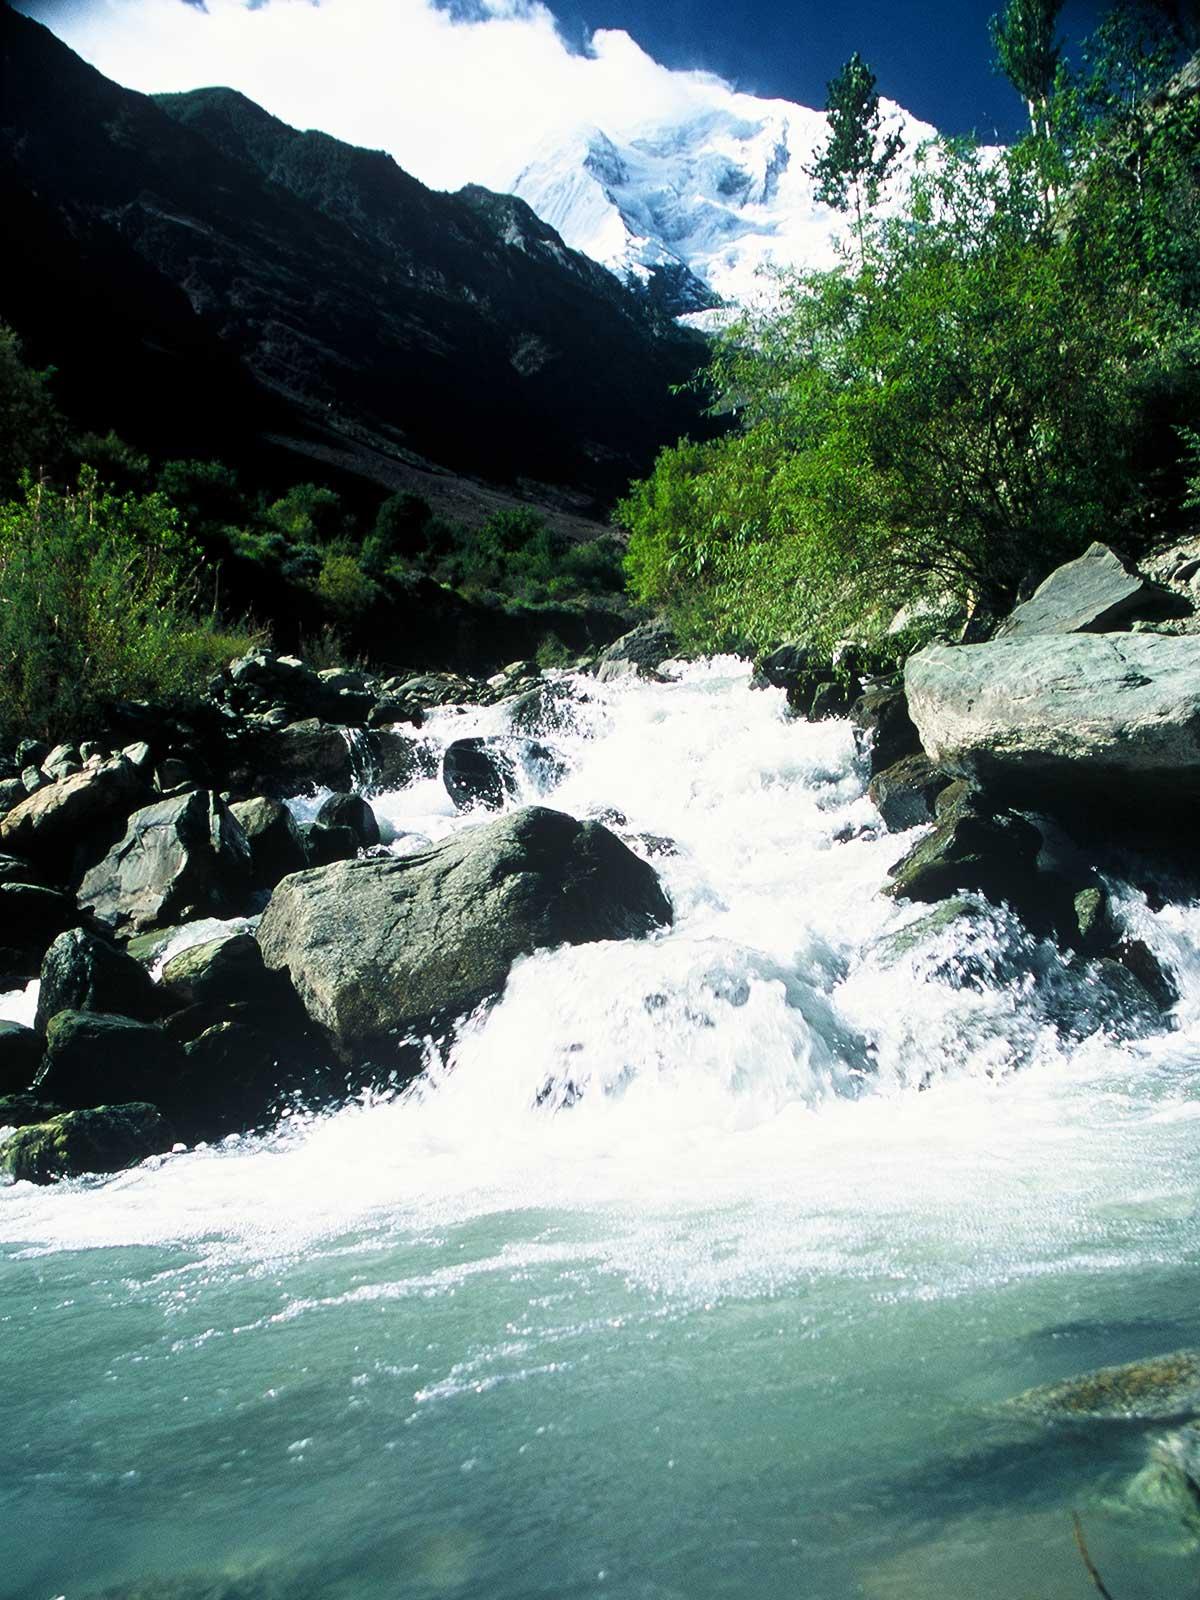 Hunza Valley | Gilgit-Baltistan- Global Warming - Pakistan - Photo Steven Martin PhD